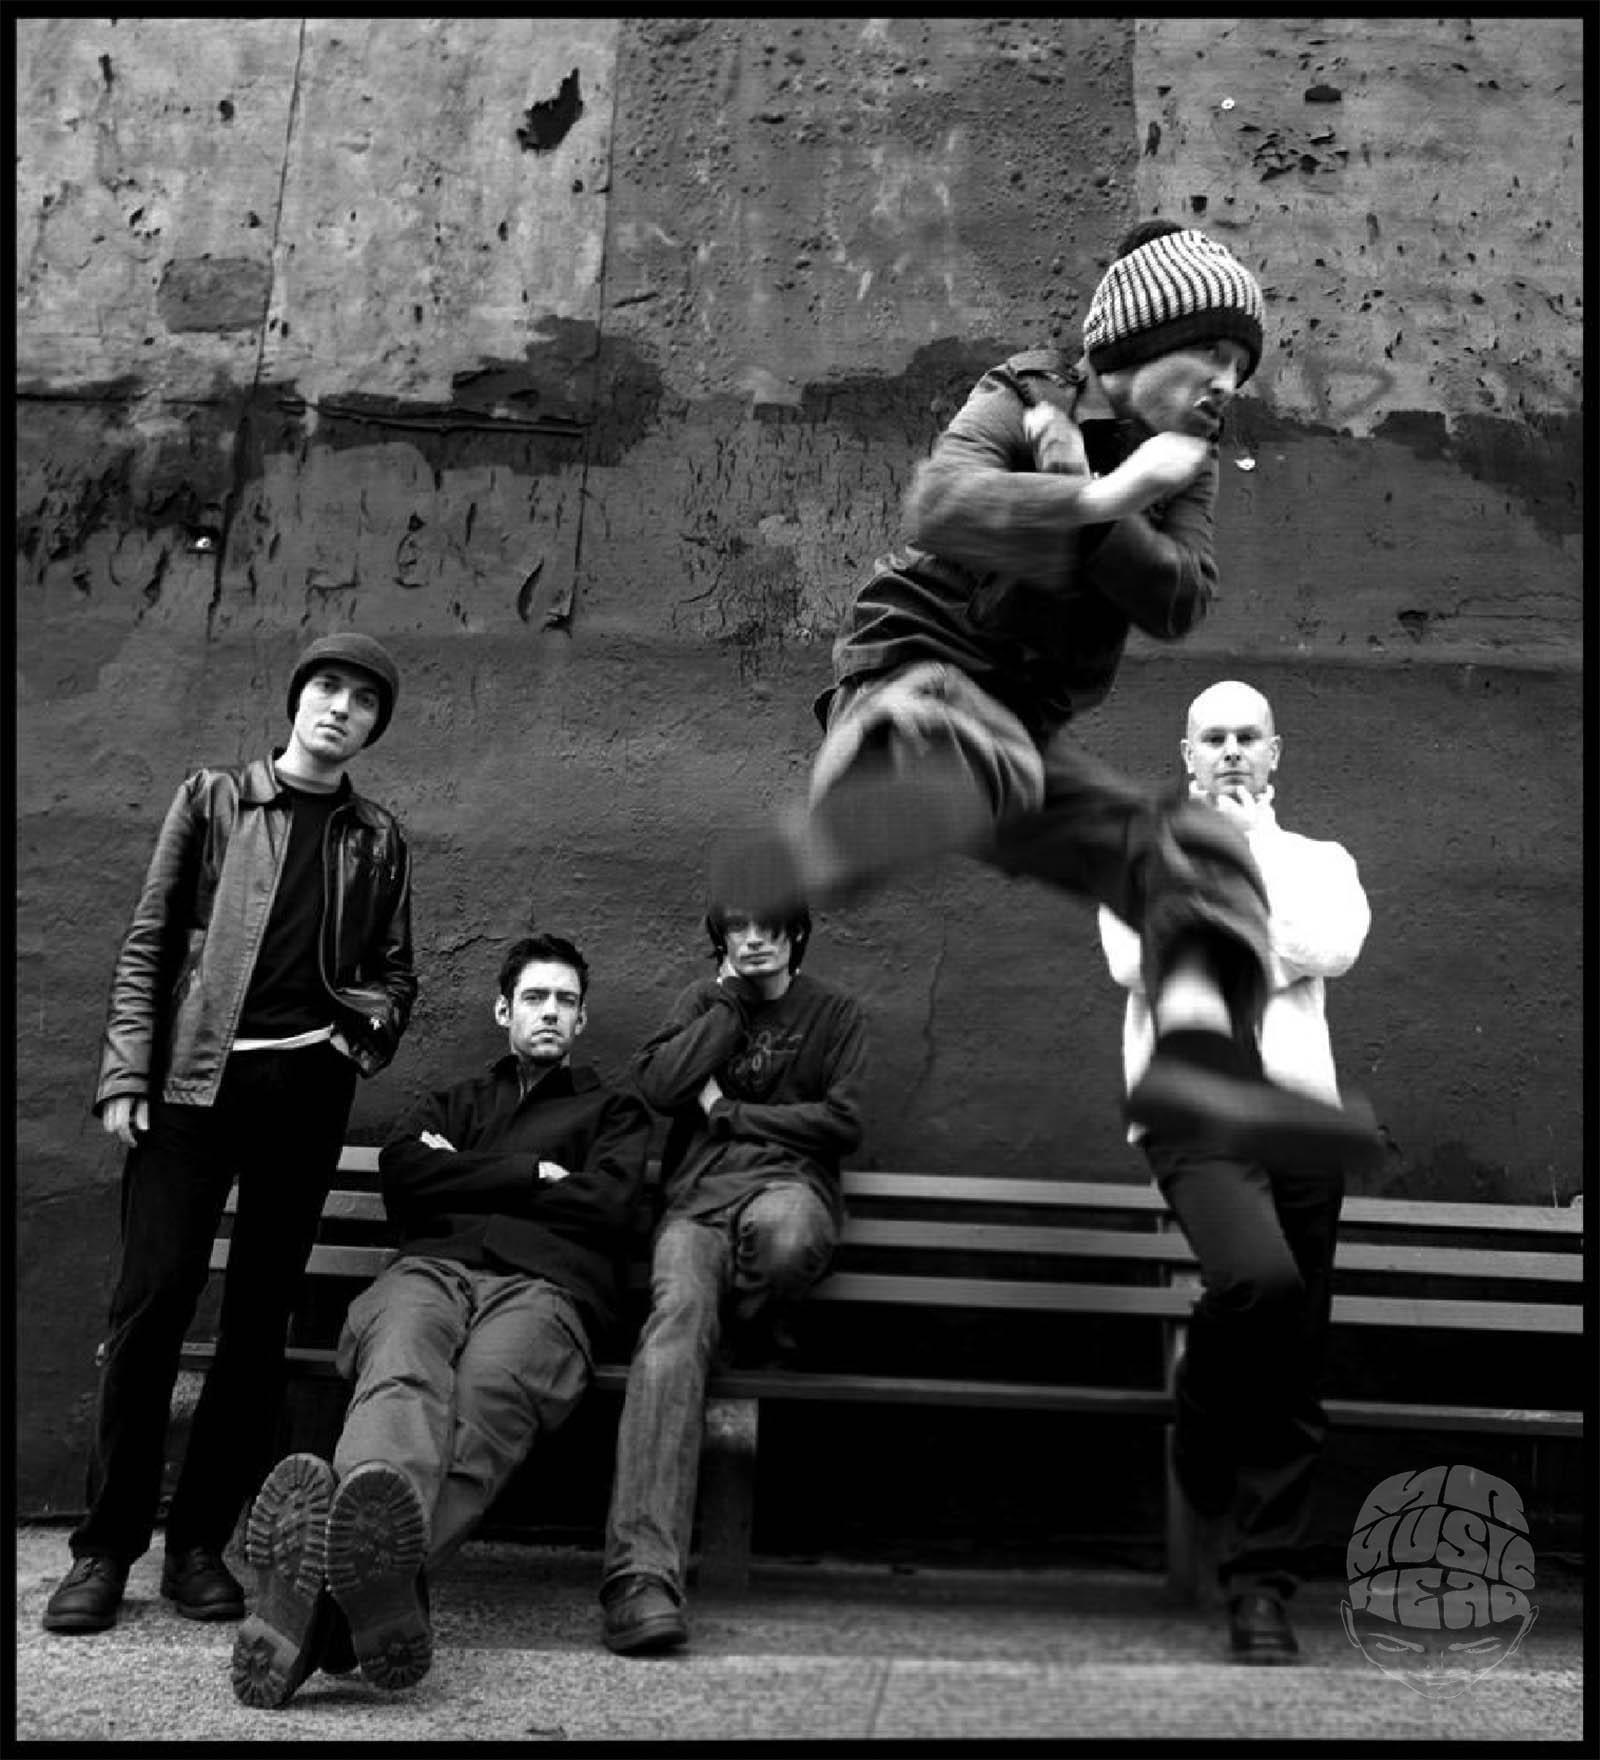 Danny Clinch_radiohead.jpg